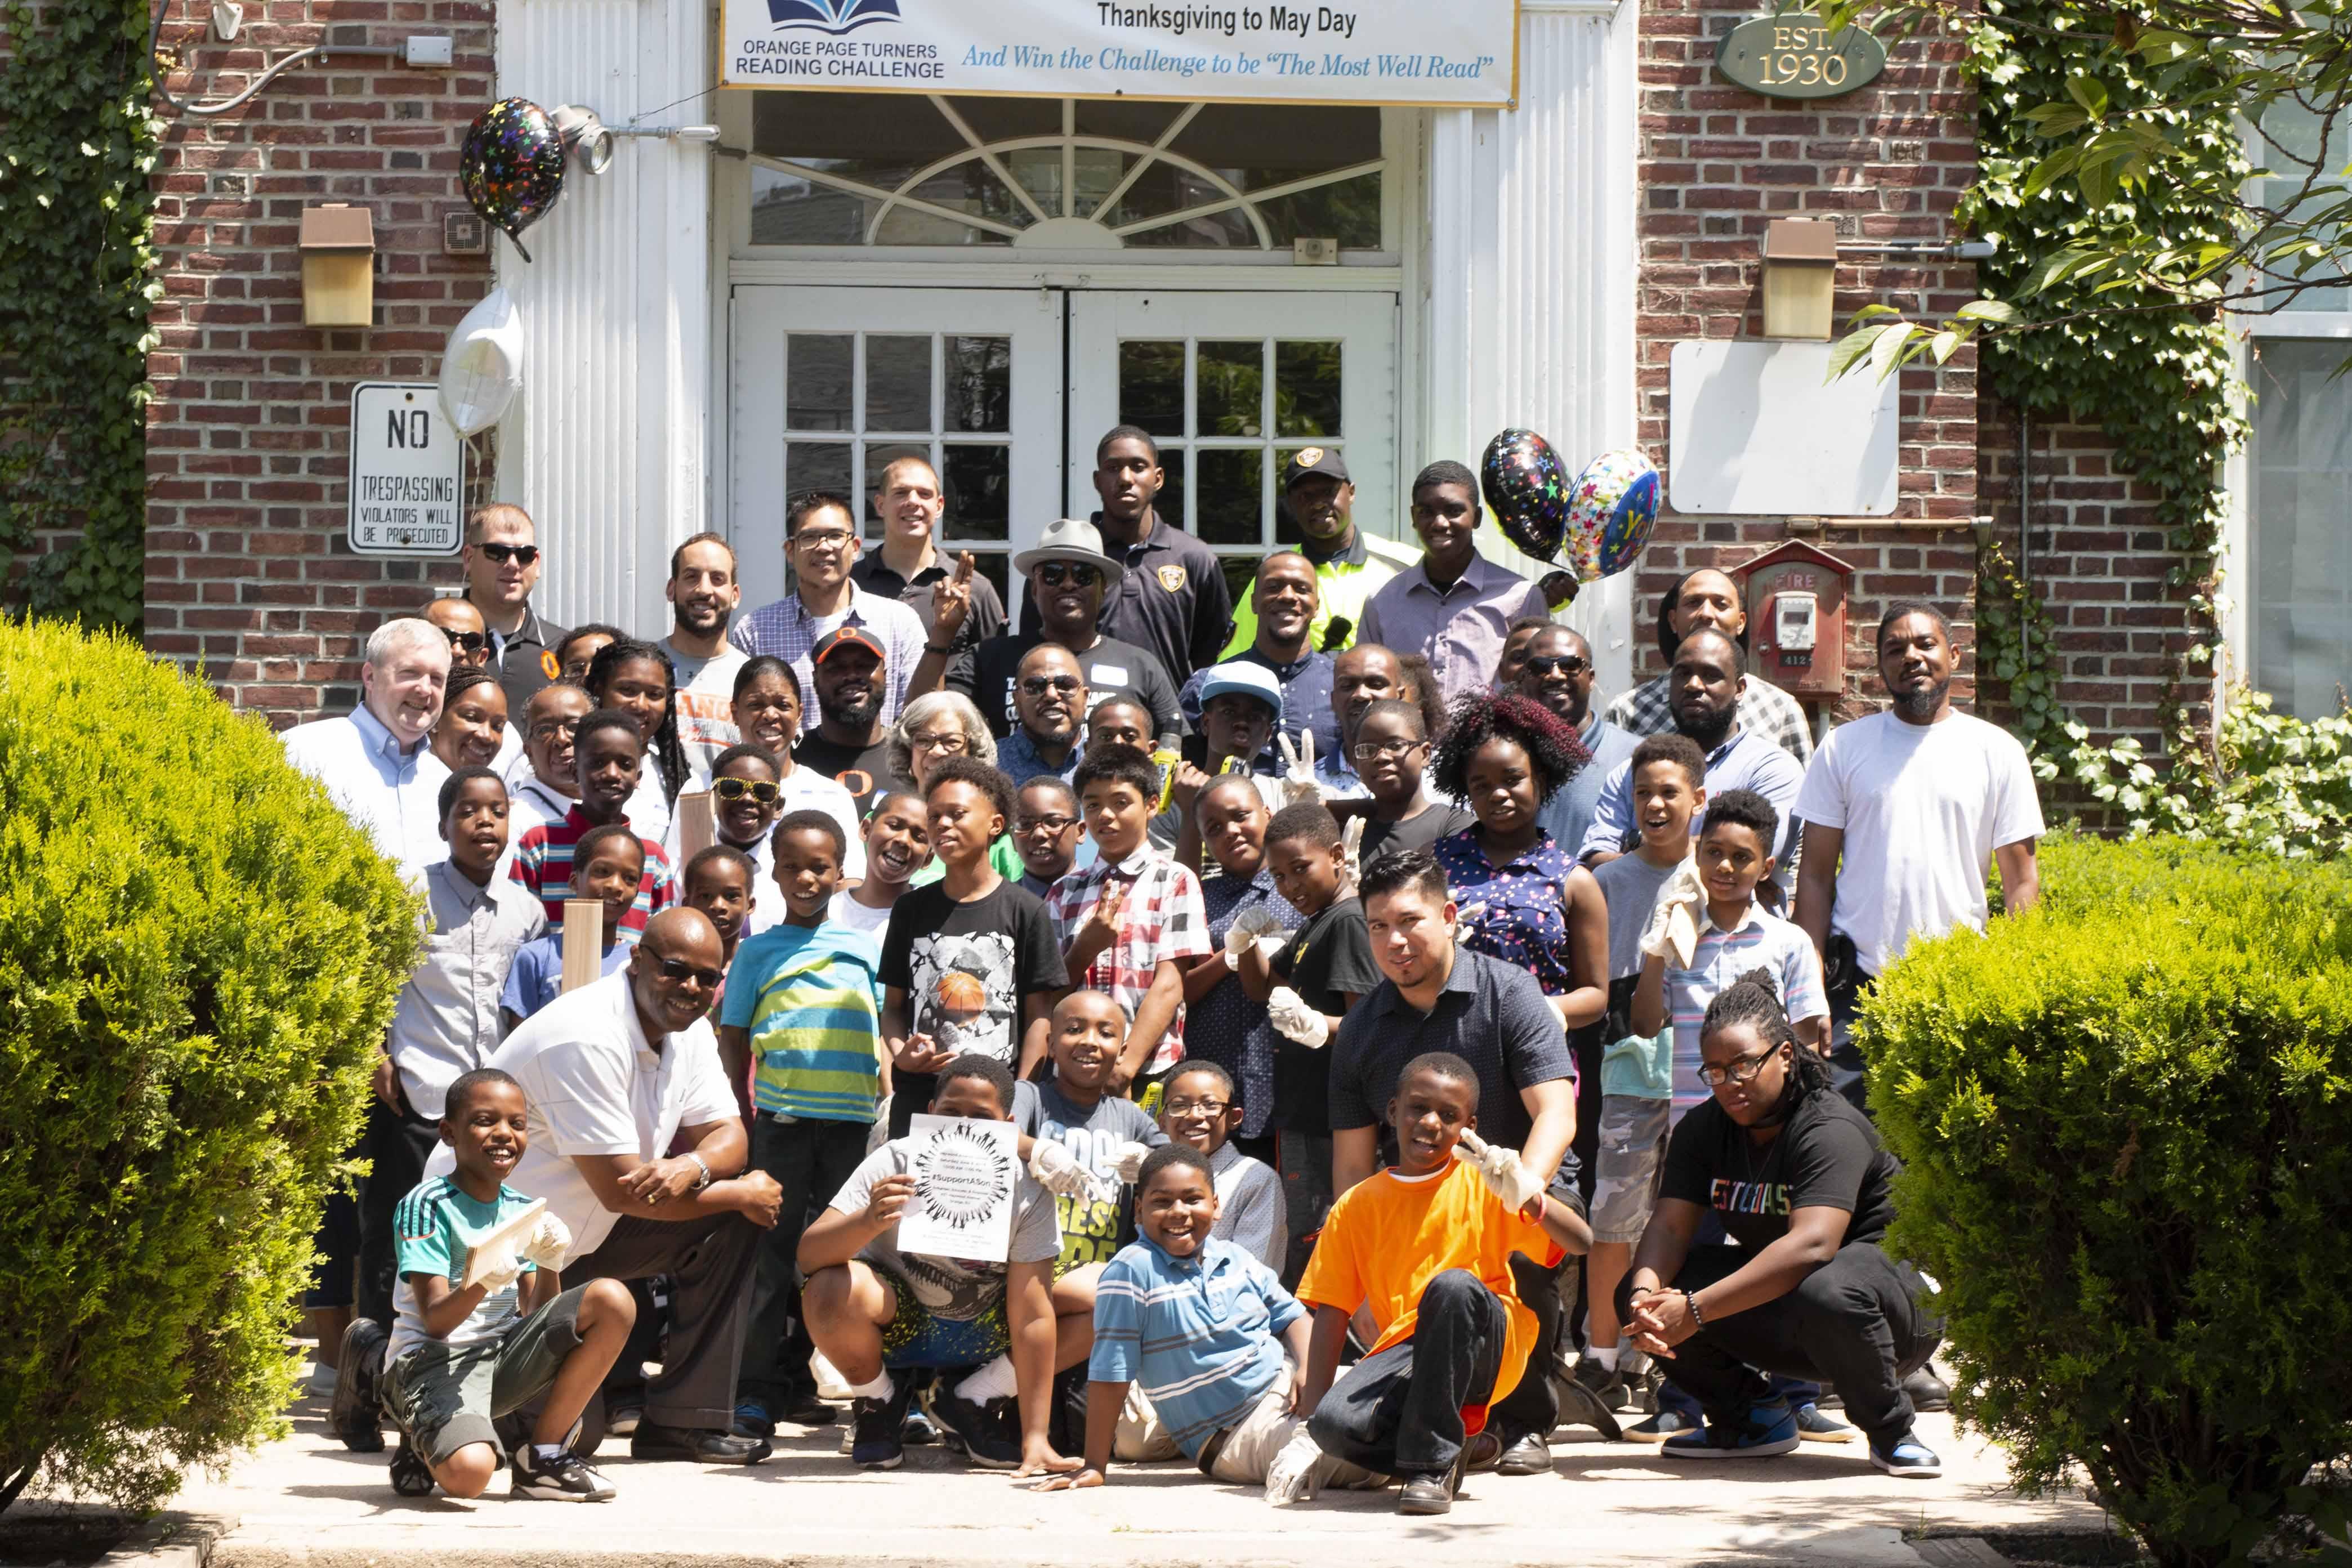 L-Train Memorial - #SupportASon (Heywood Avenue Elementary School, Orange NJ) 06-09-18_0044